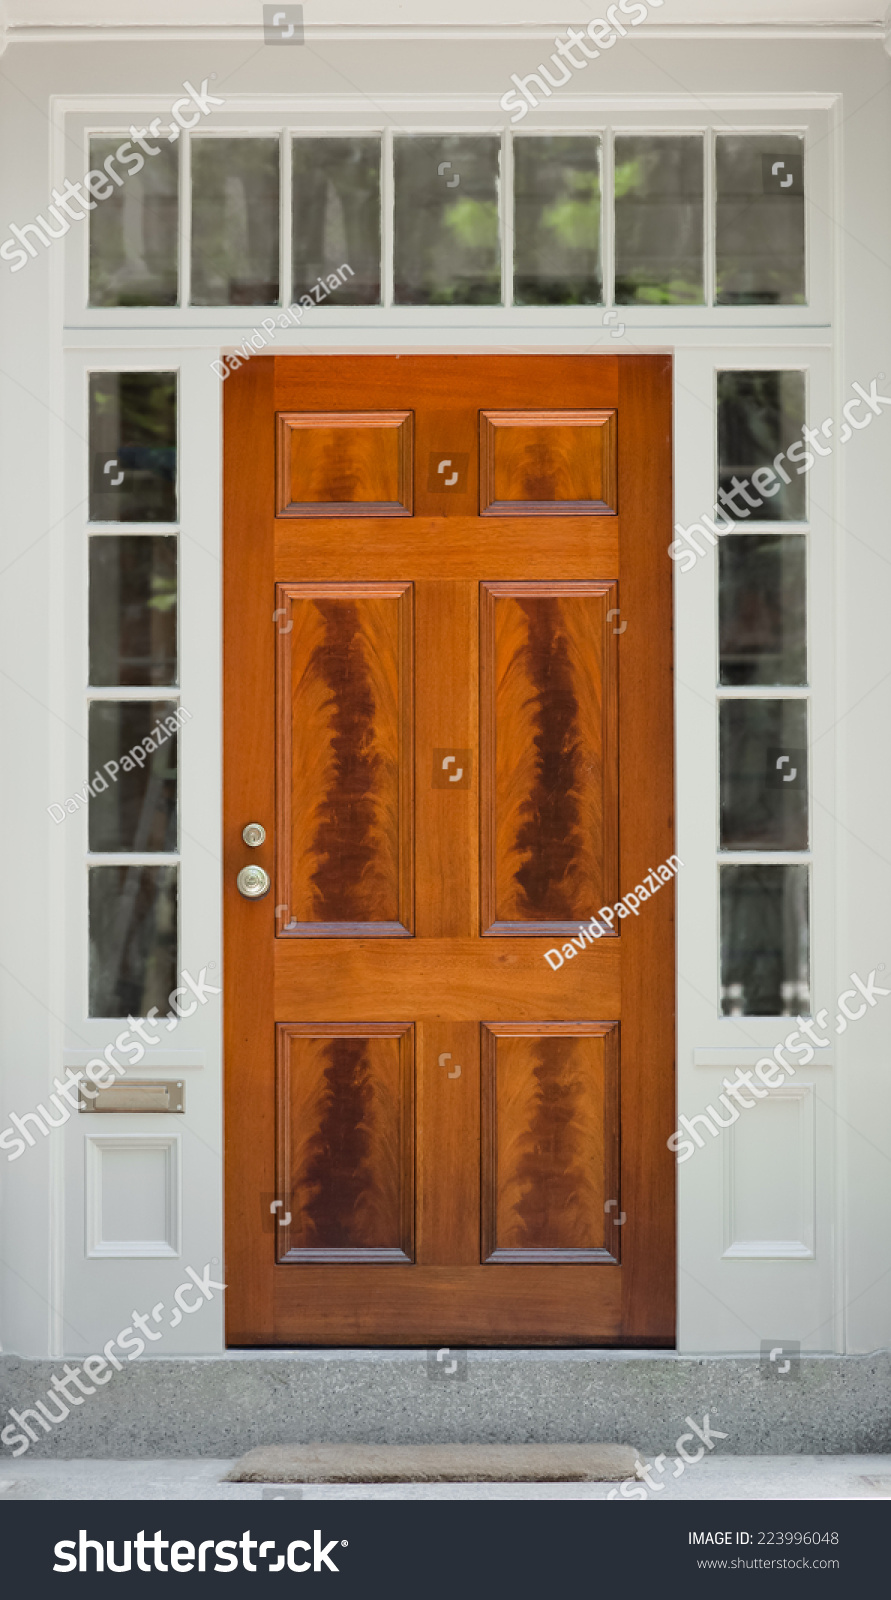 Natural Wood Front Door With White Door Frame And Windows